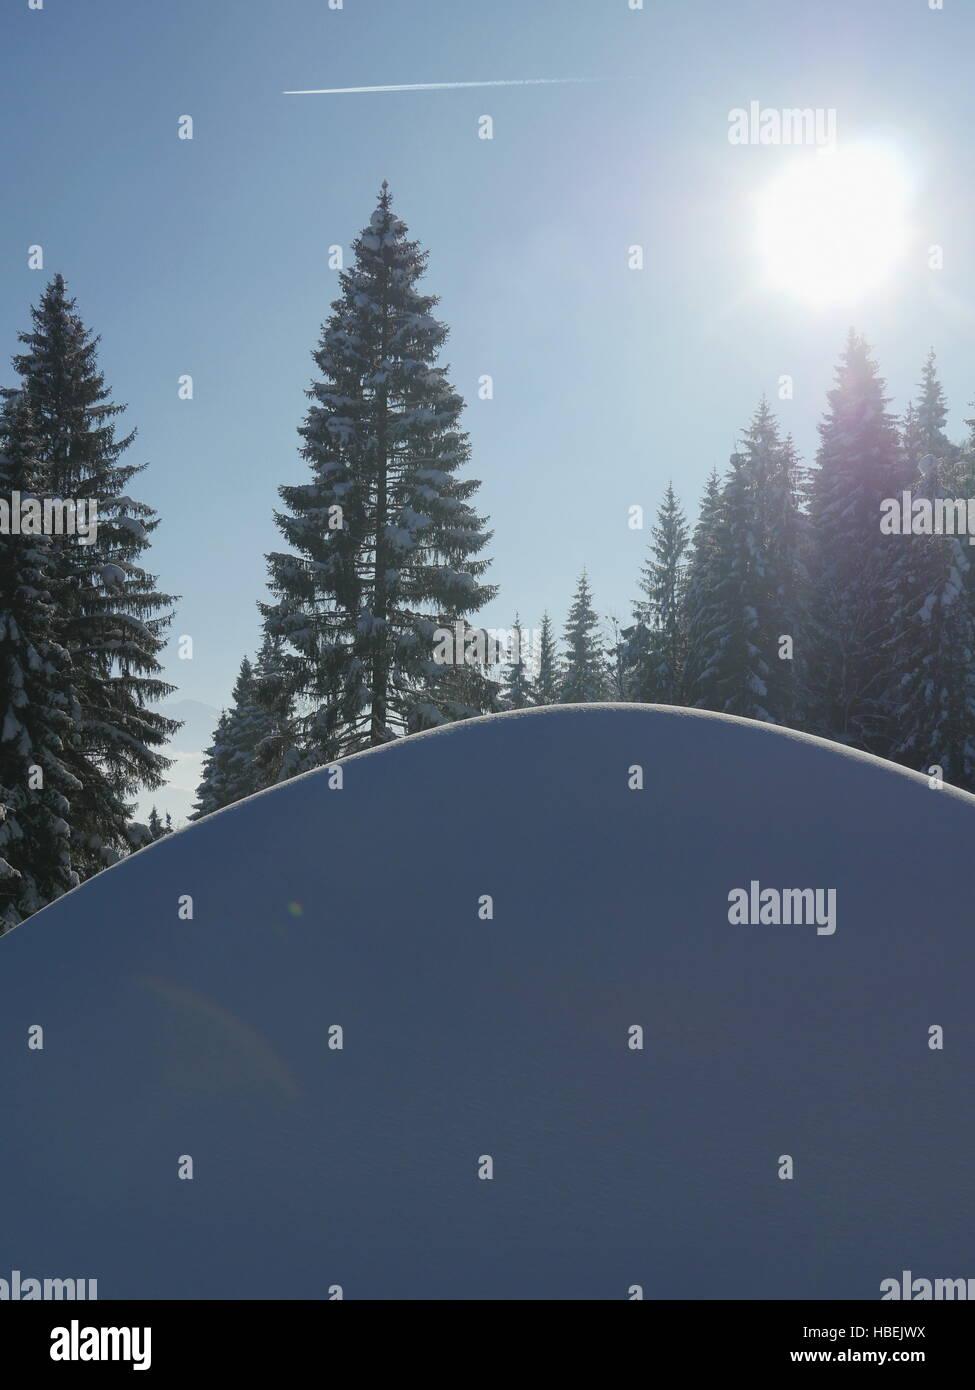 Close-up of snowdrift in sunshine - Stock Image